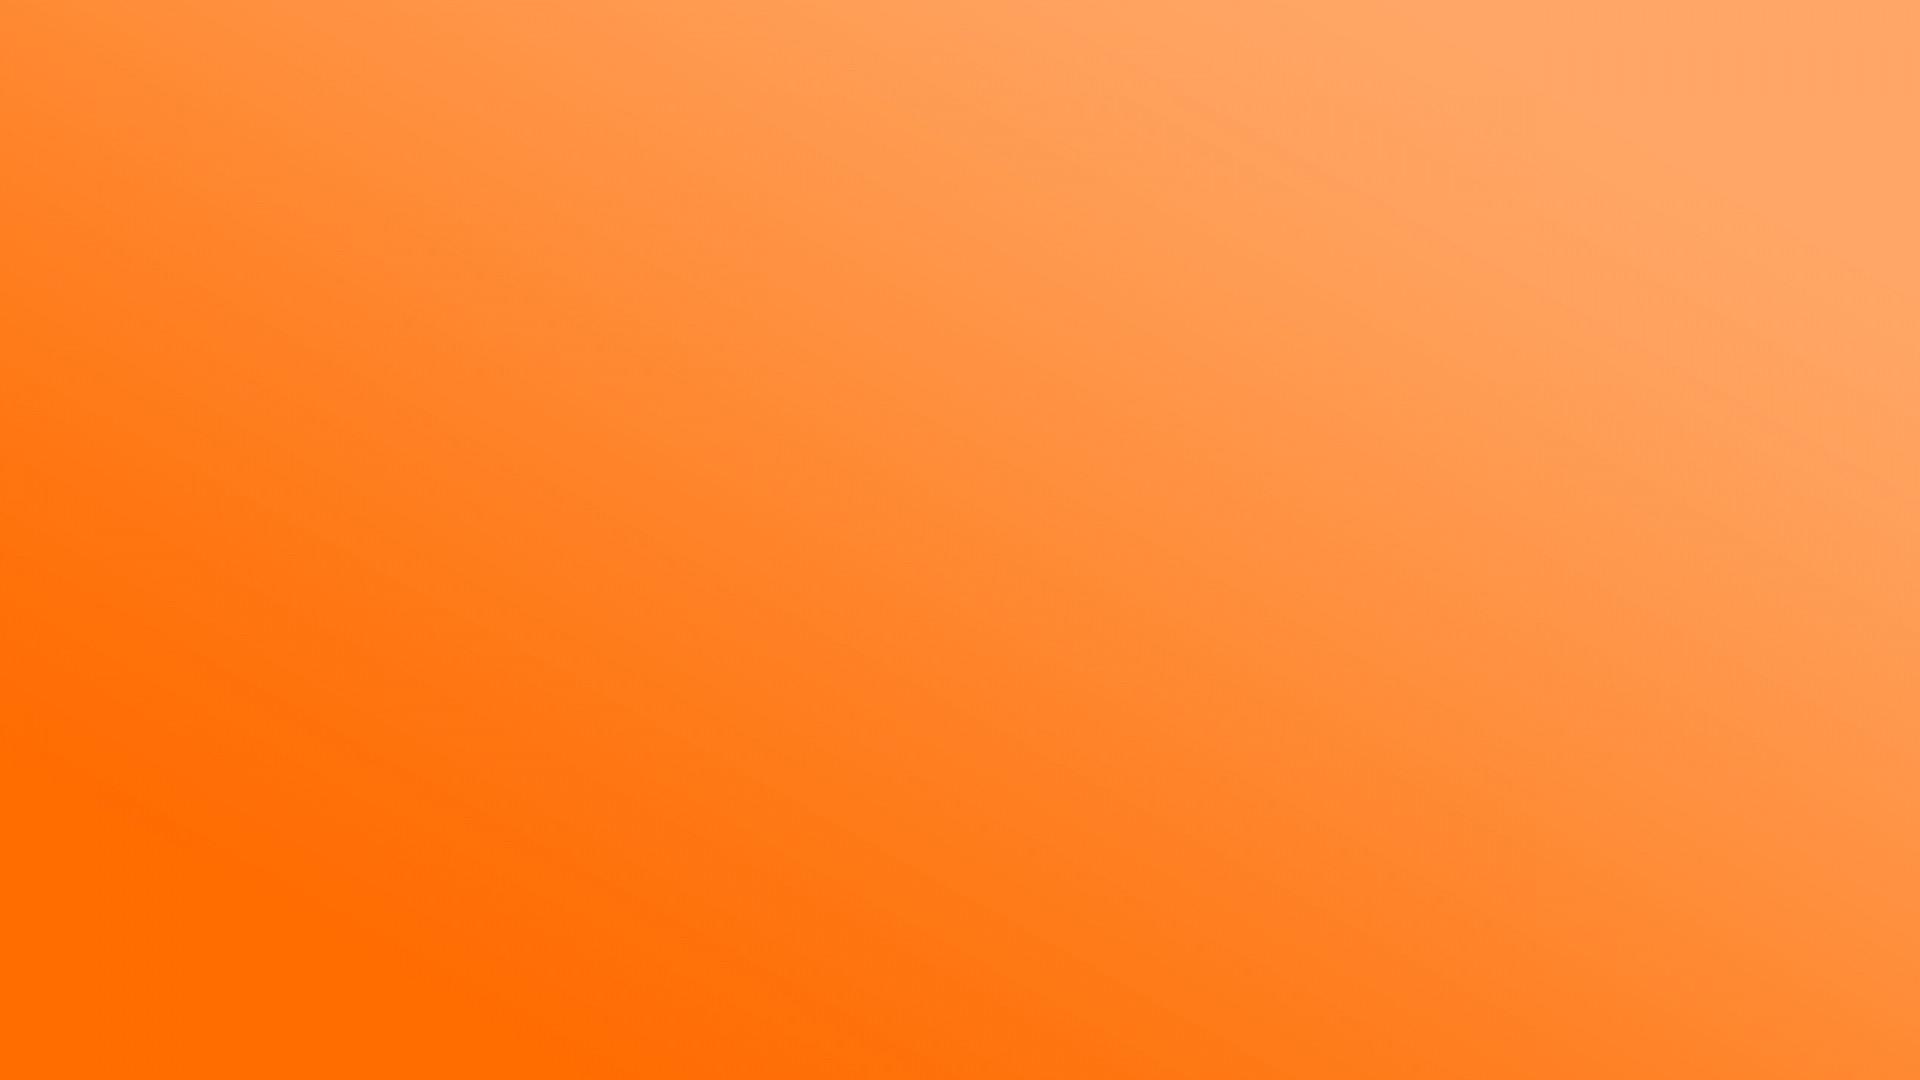 1920x1080 Preview Wallpaper Orange White Solid Colorful